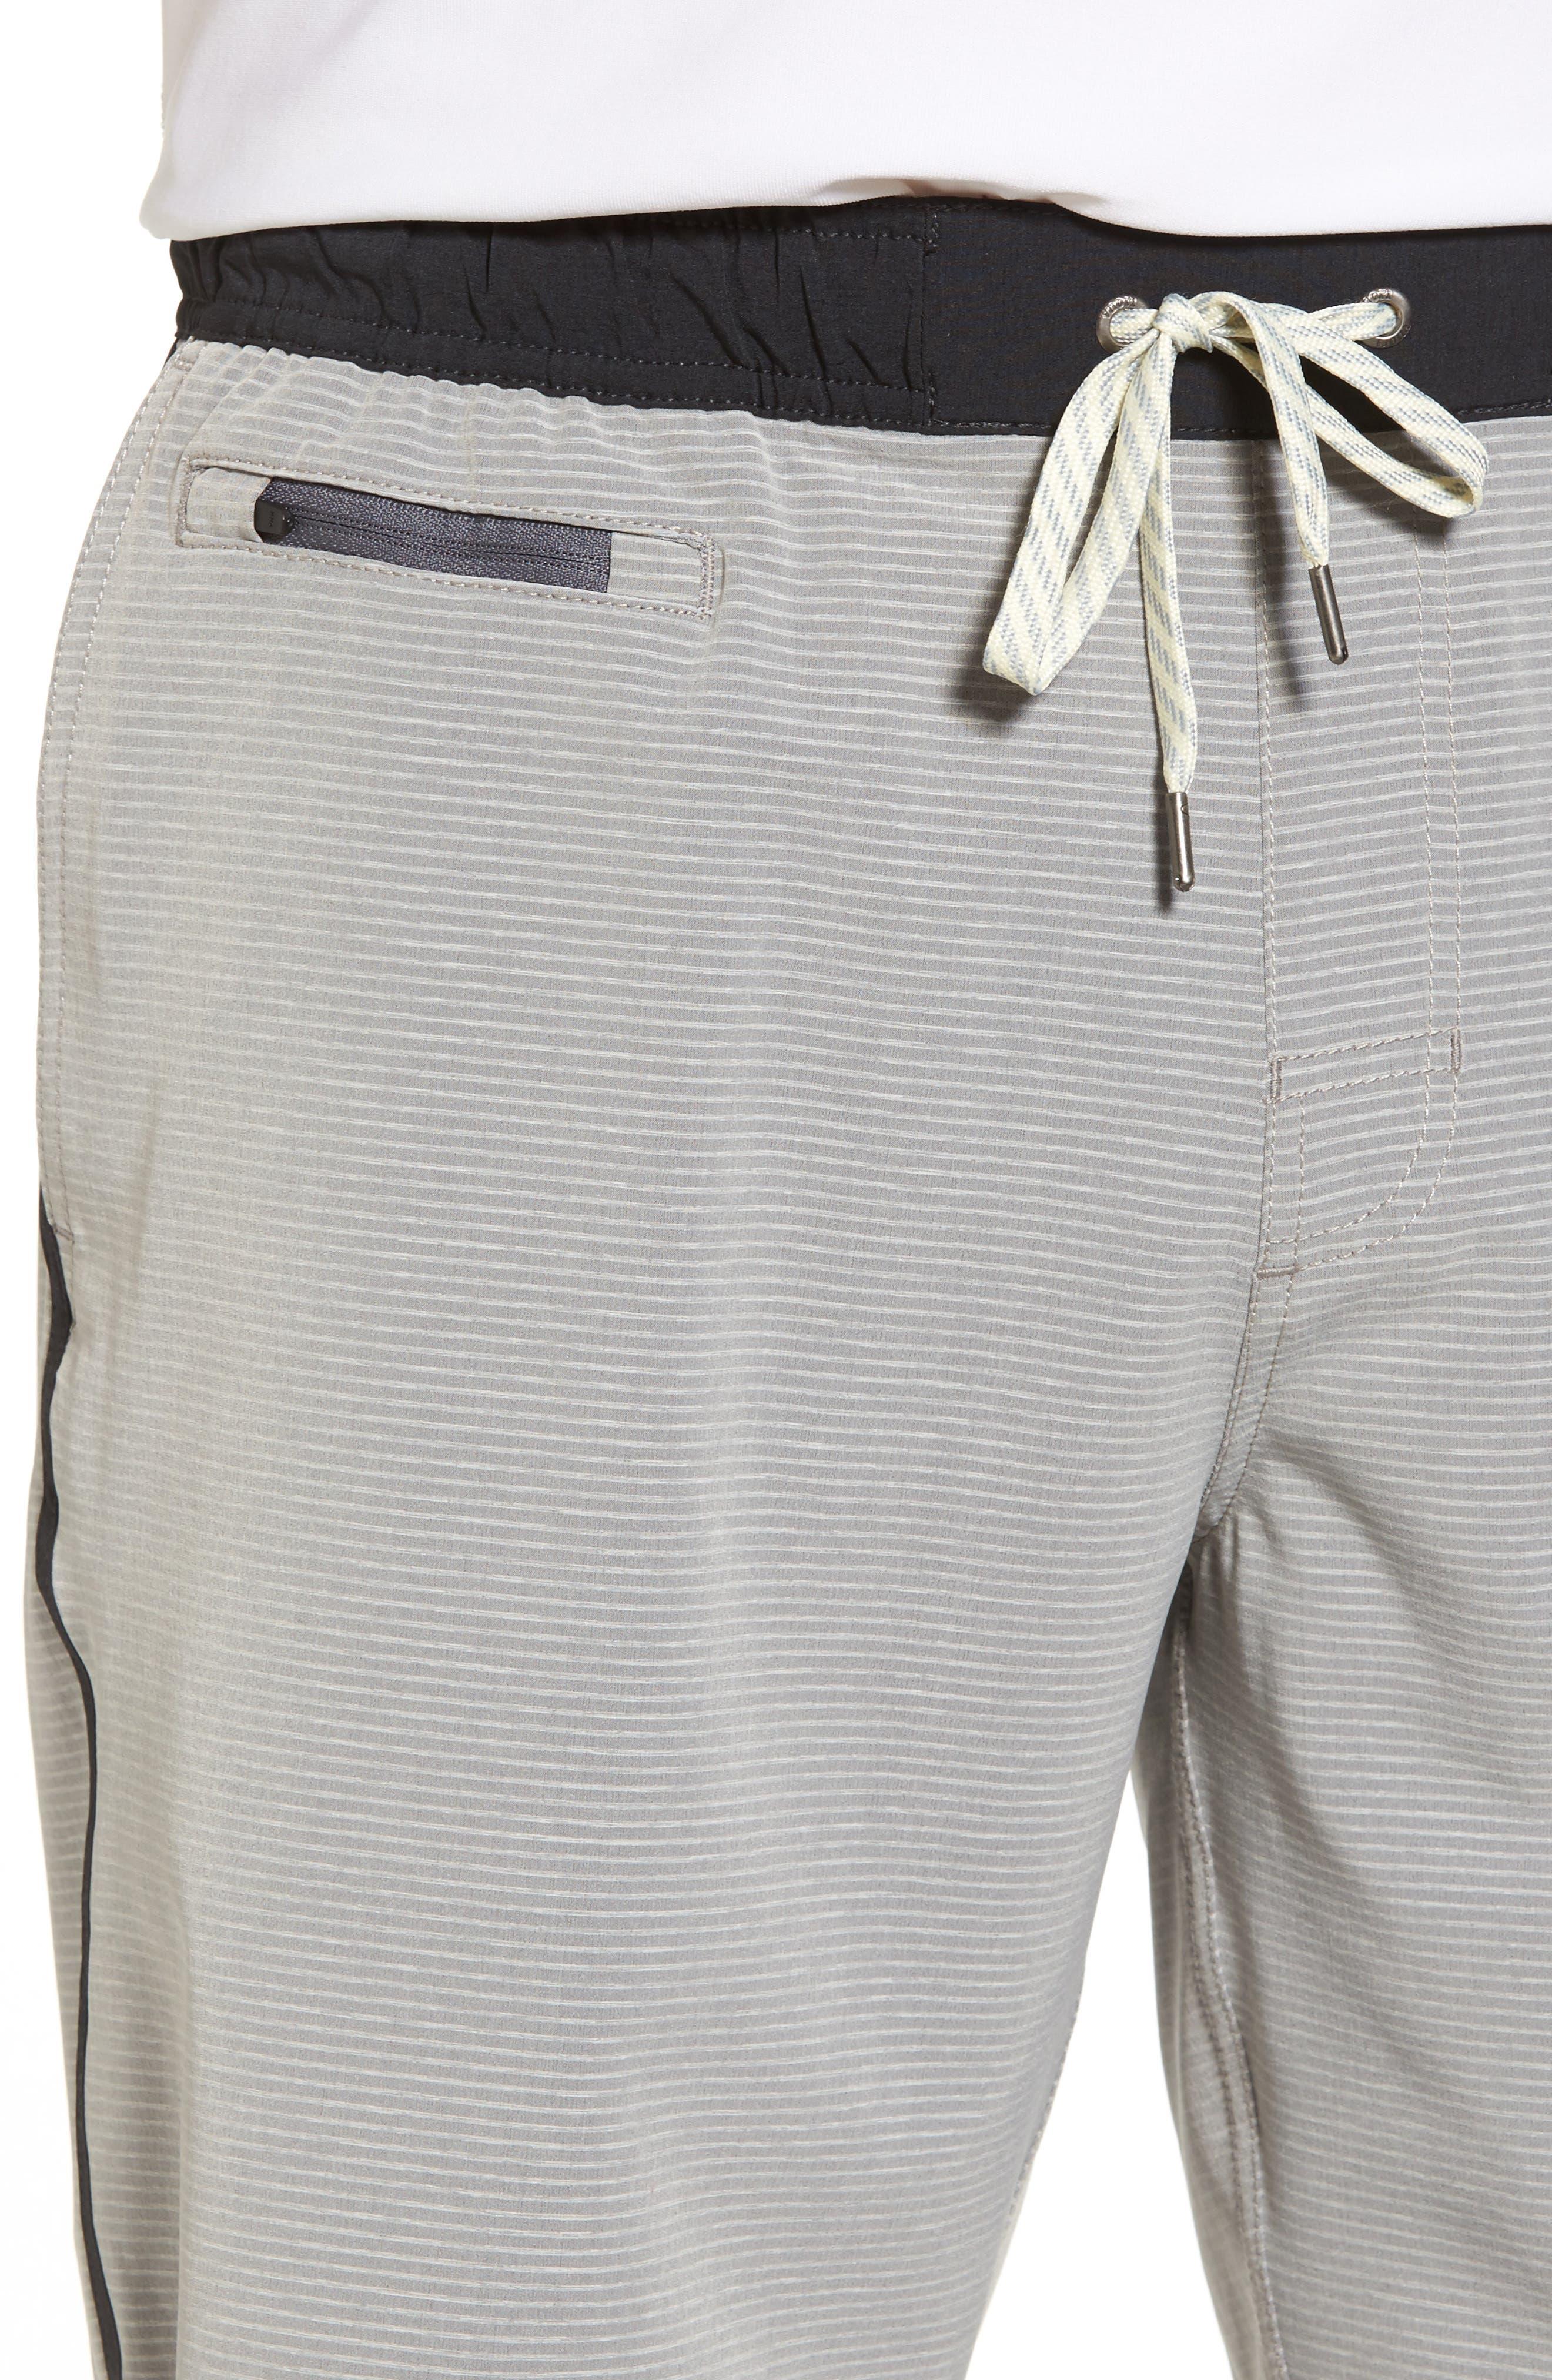 Banks Athletic Shorts,                             Alternate thumbnail 4, color,                             050